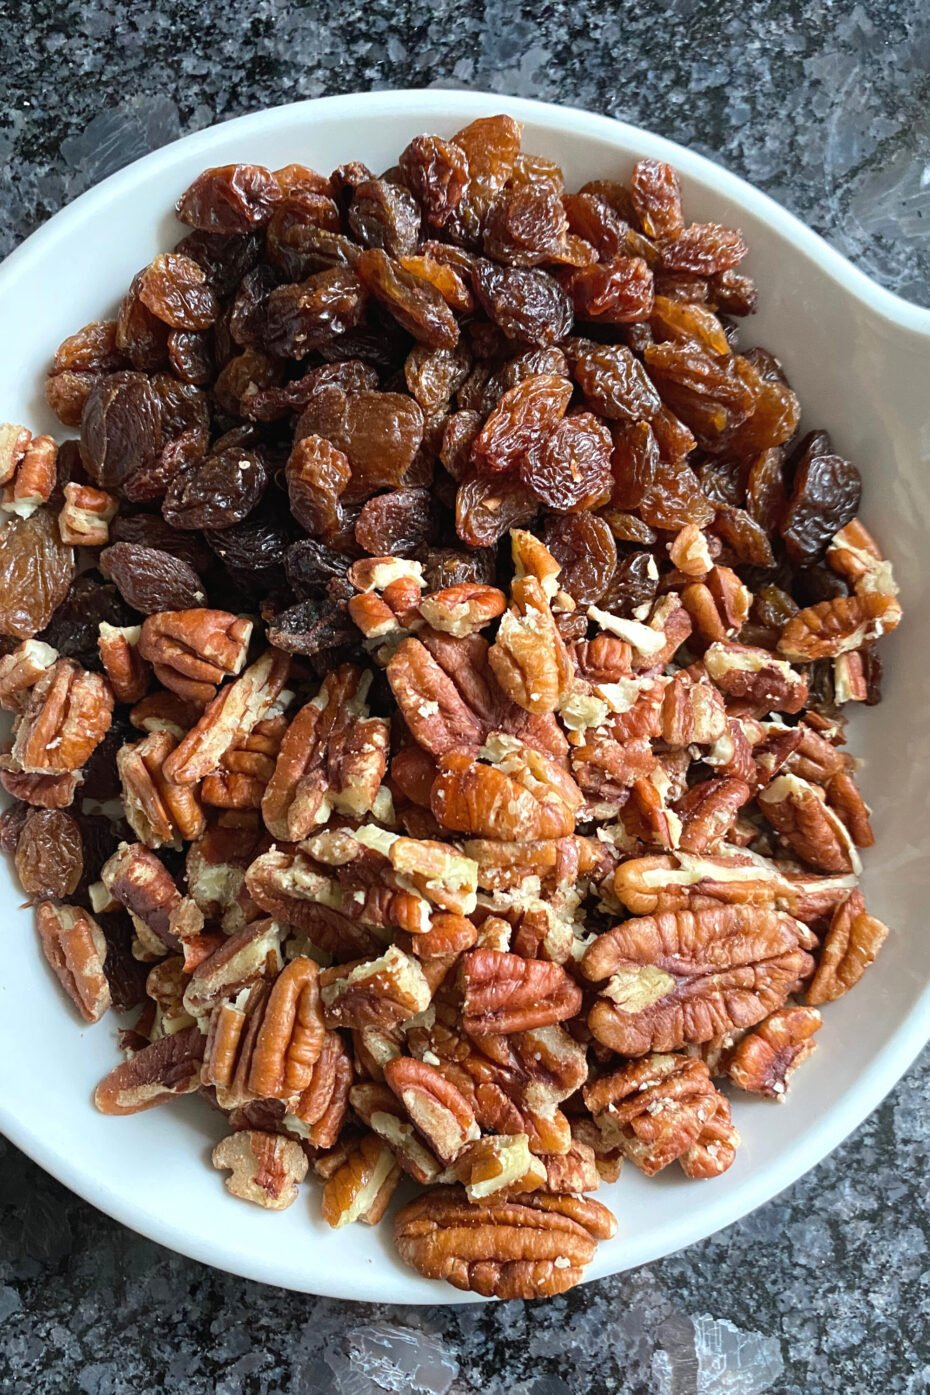 Pecan and Raisin Oatmeal Cookies, pecan nuts and raisins